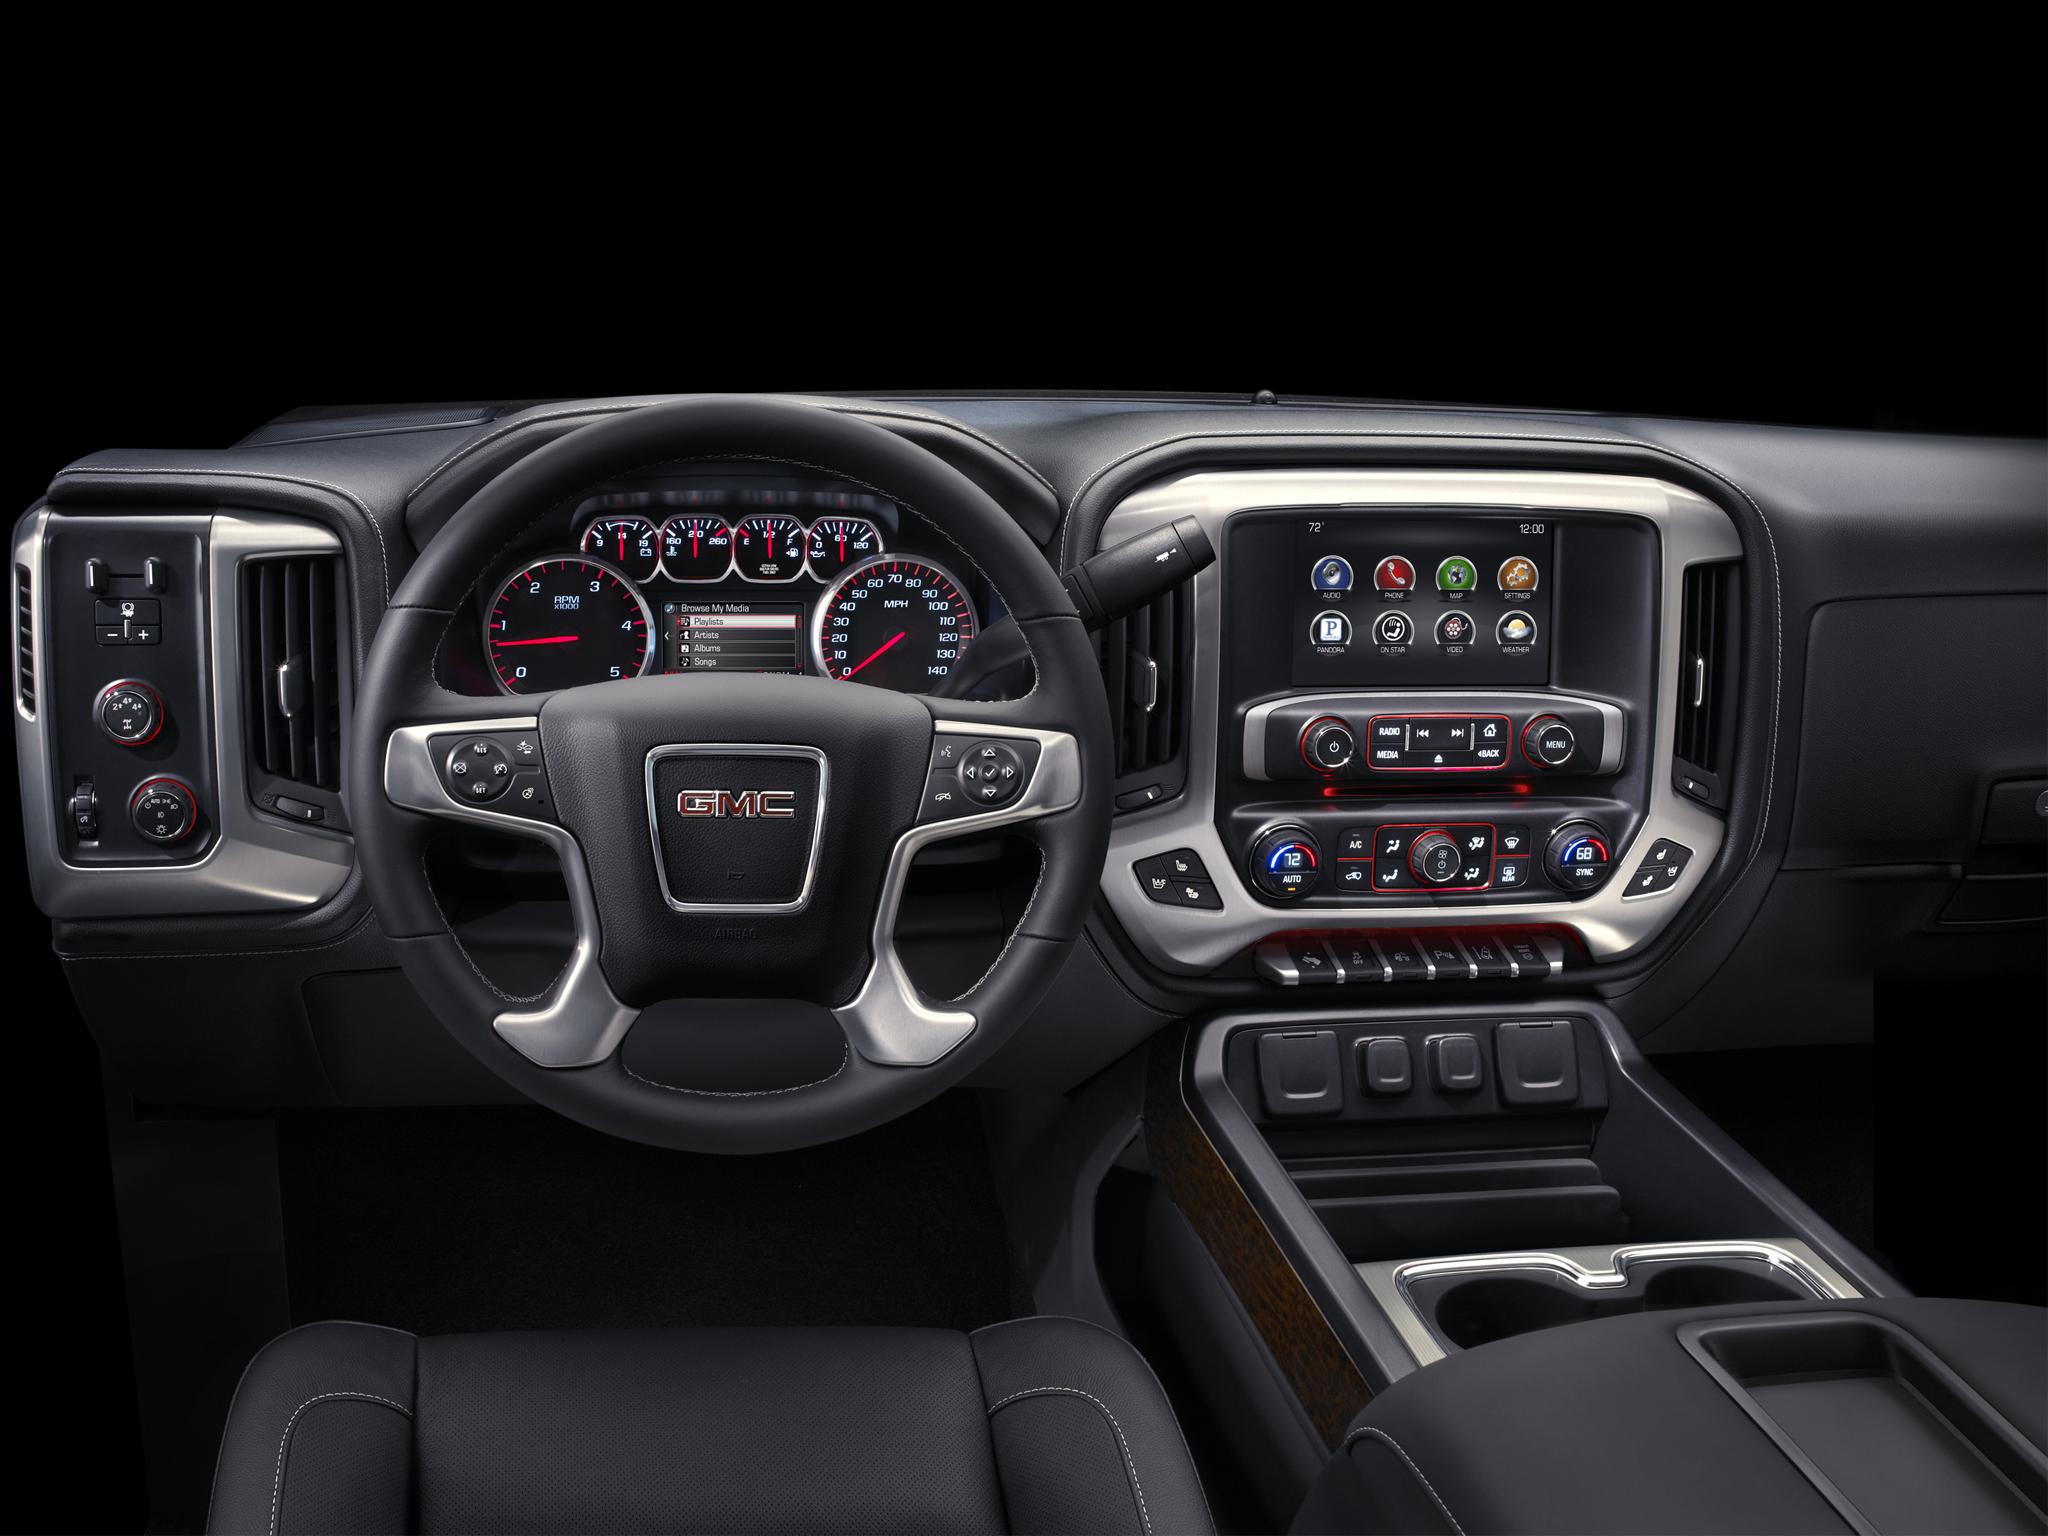 2014 GMC Sierra 2500 HD SLT Crew Cab pickup interior f wallpaper | 2048x1536 | 152396 | WallpaperUP